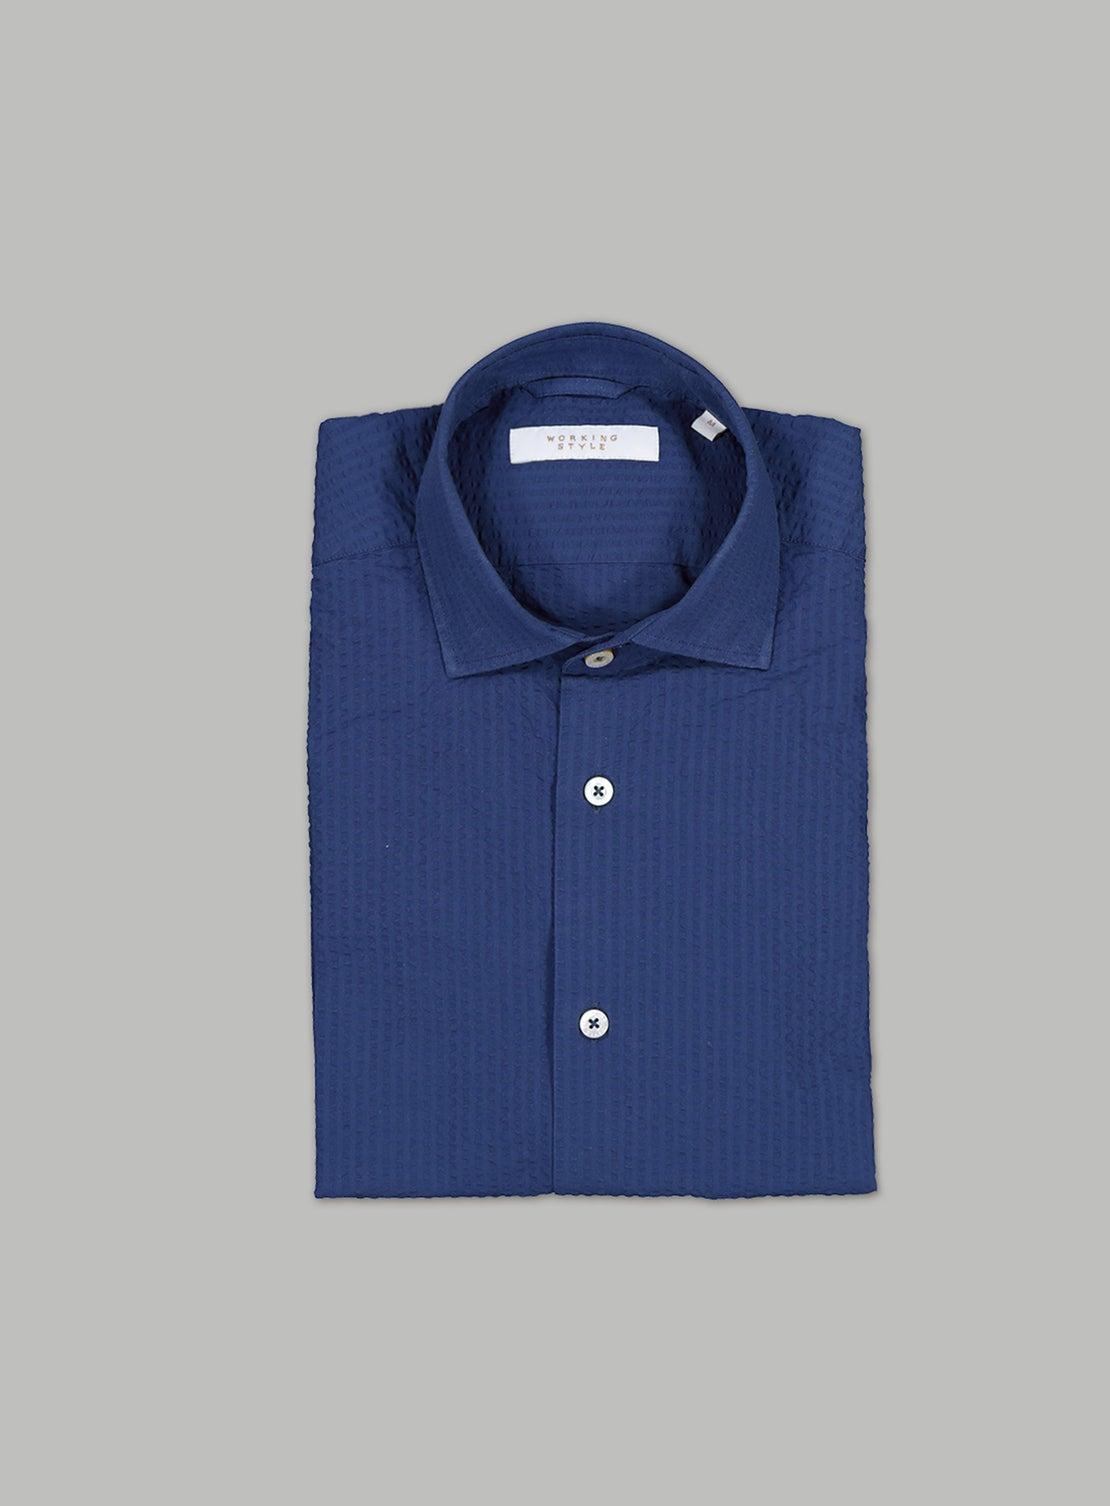 Navy Seersucker Self Stripe Shirt